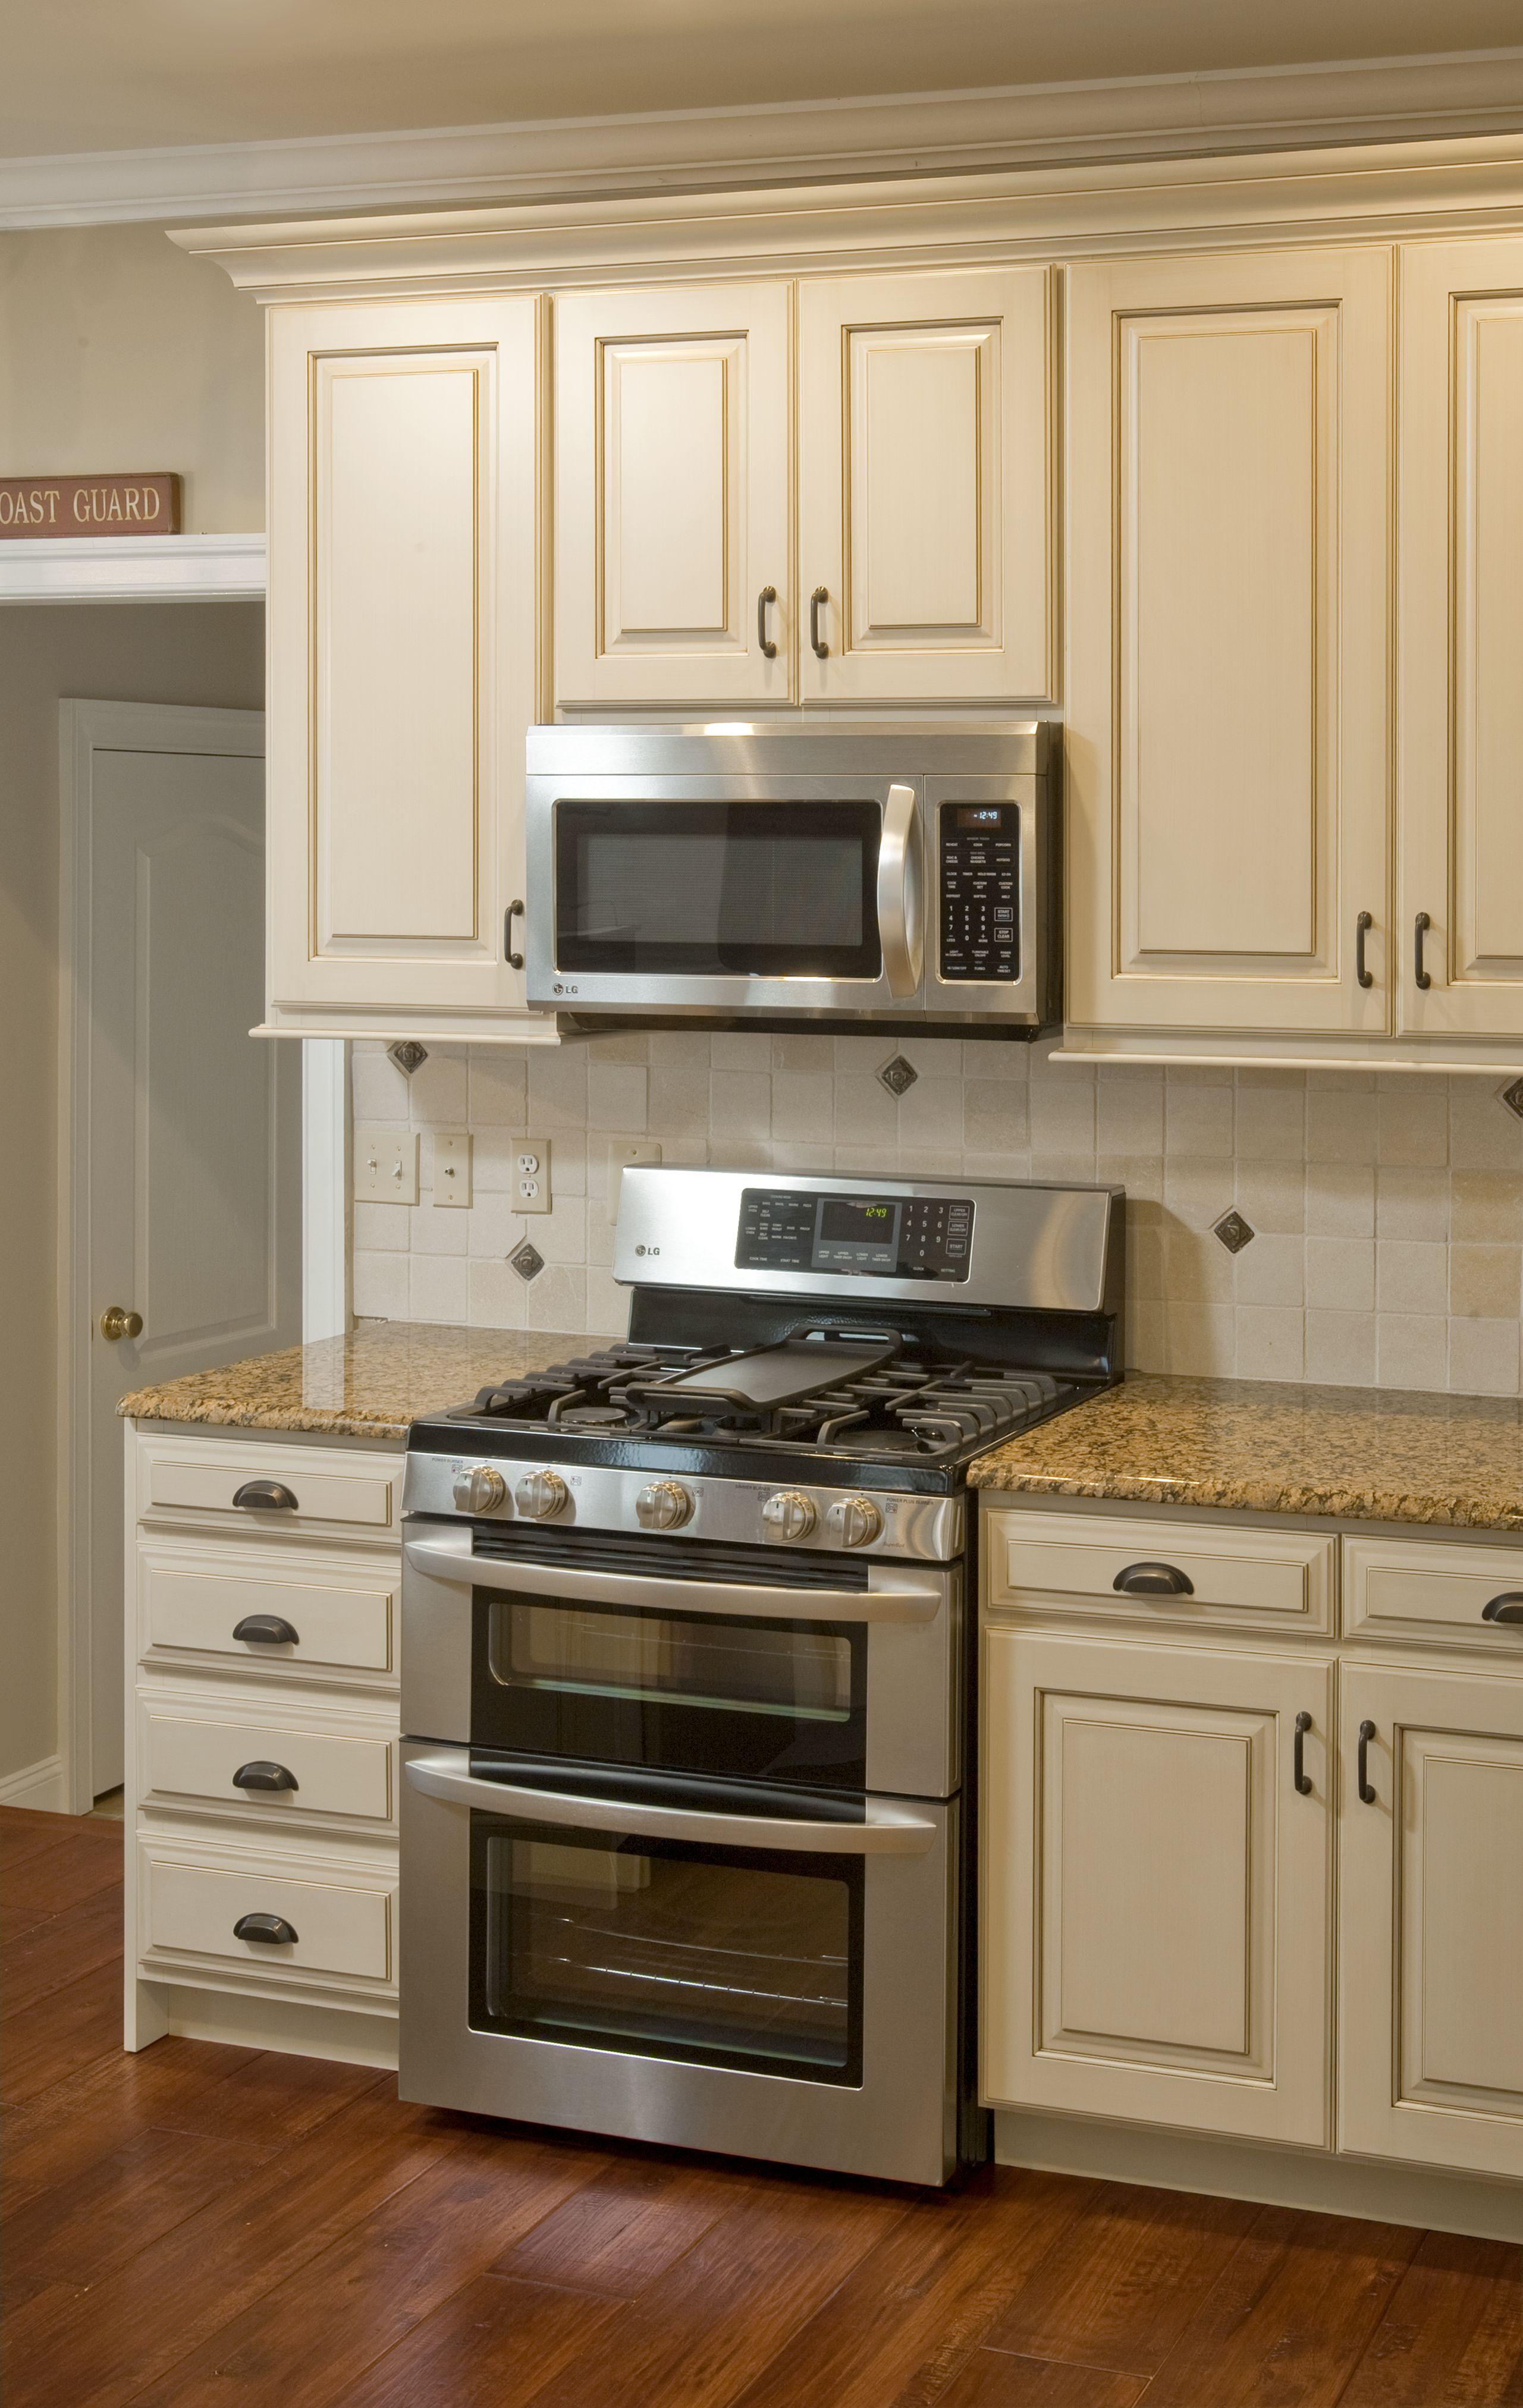 Best Kitchen Gallery: Restored Kitchen Cabi S Not Pure White More Of An Off White of Beige Kitchen Cabinets on rachelxblog.com